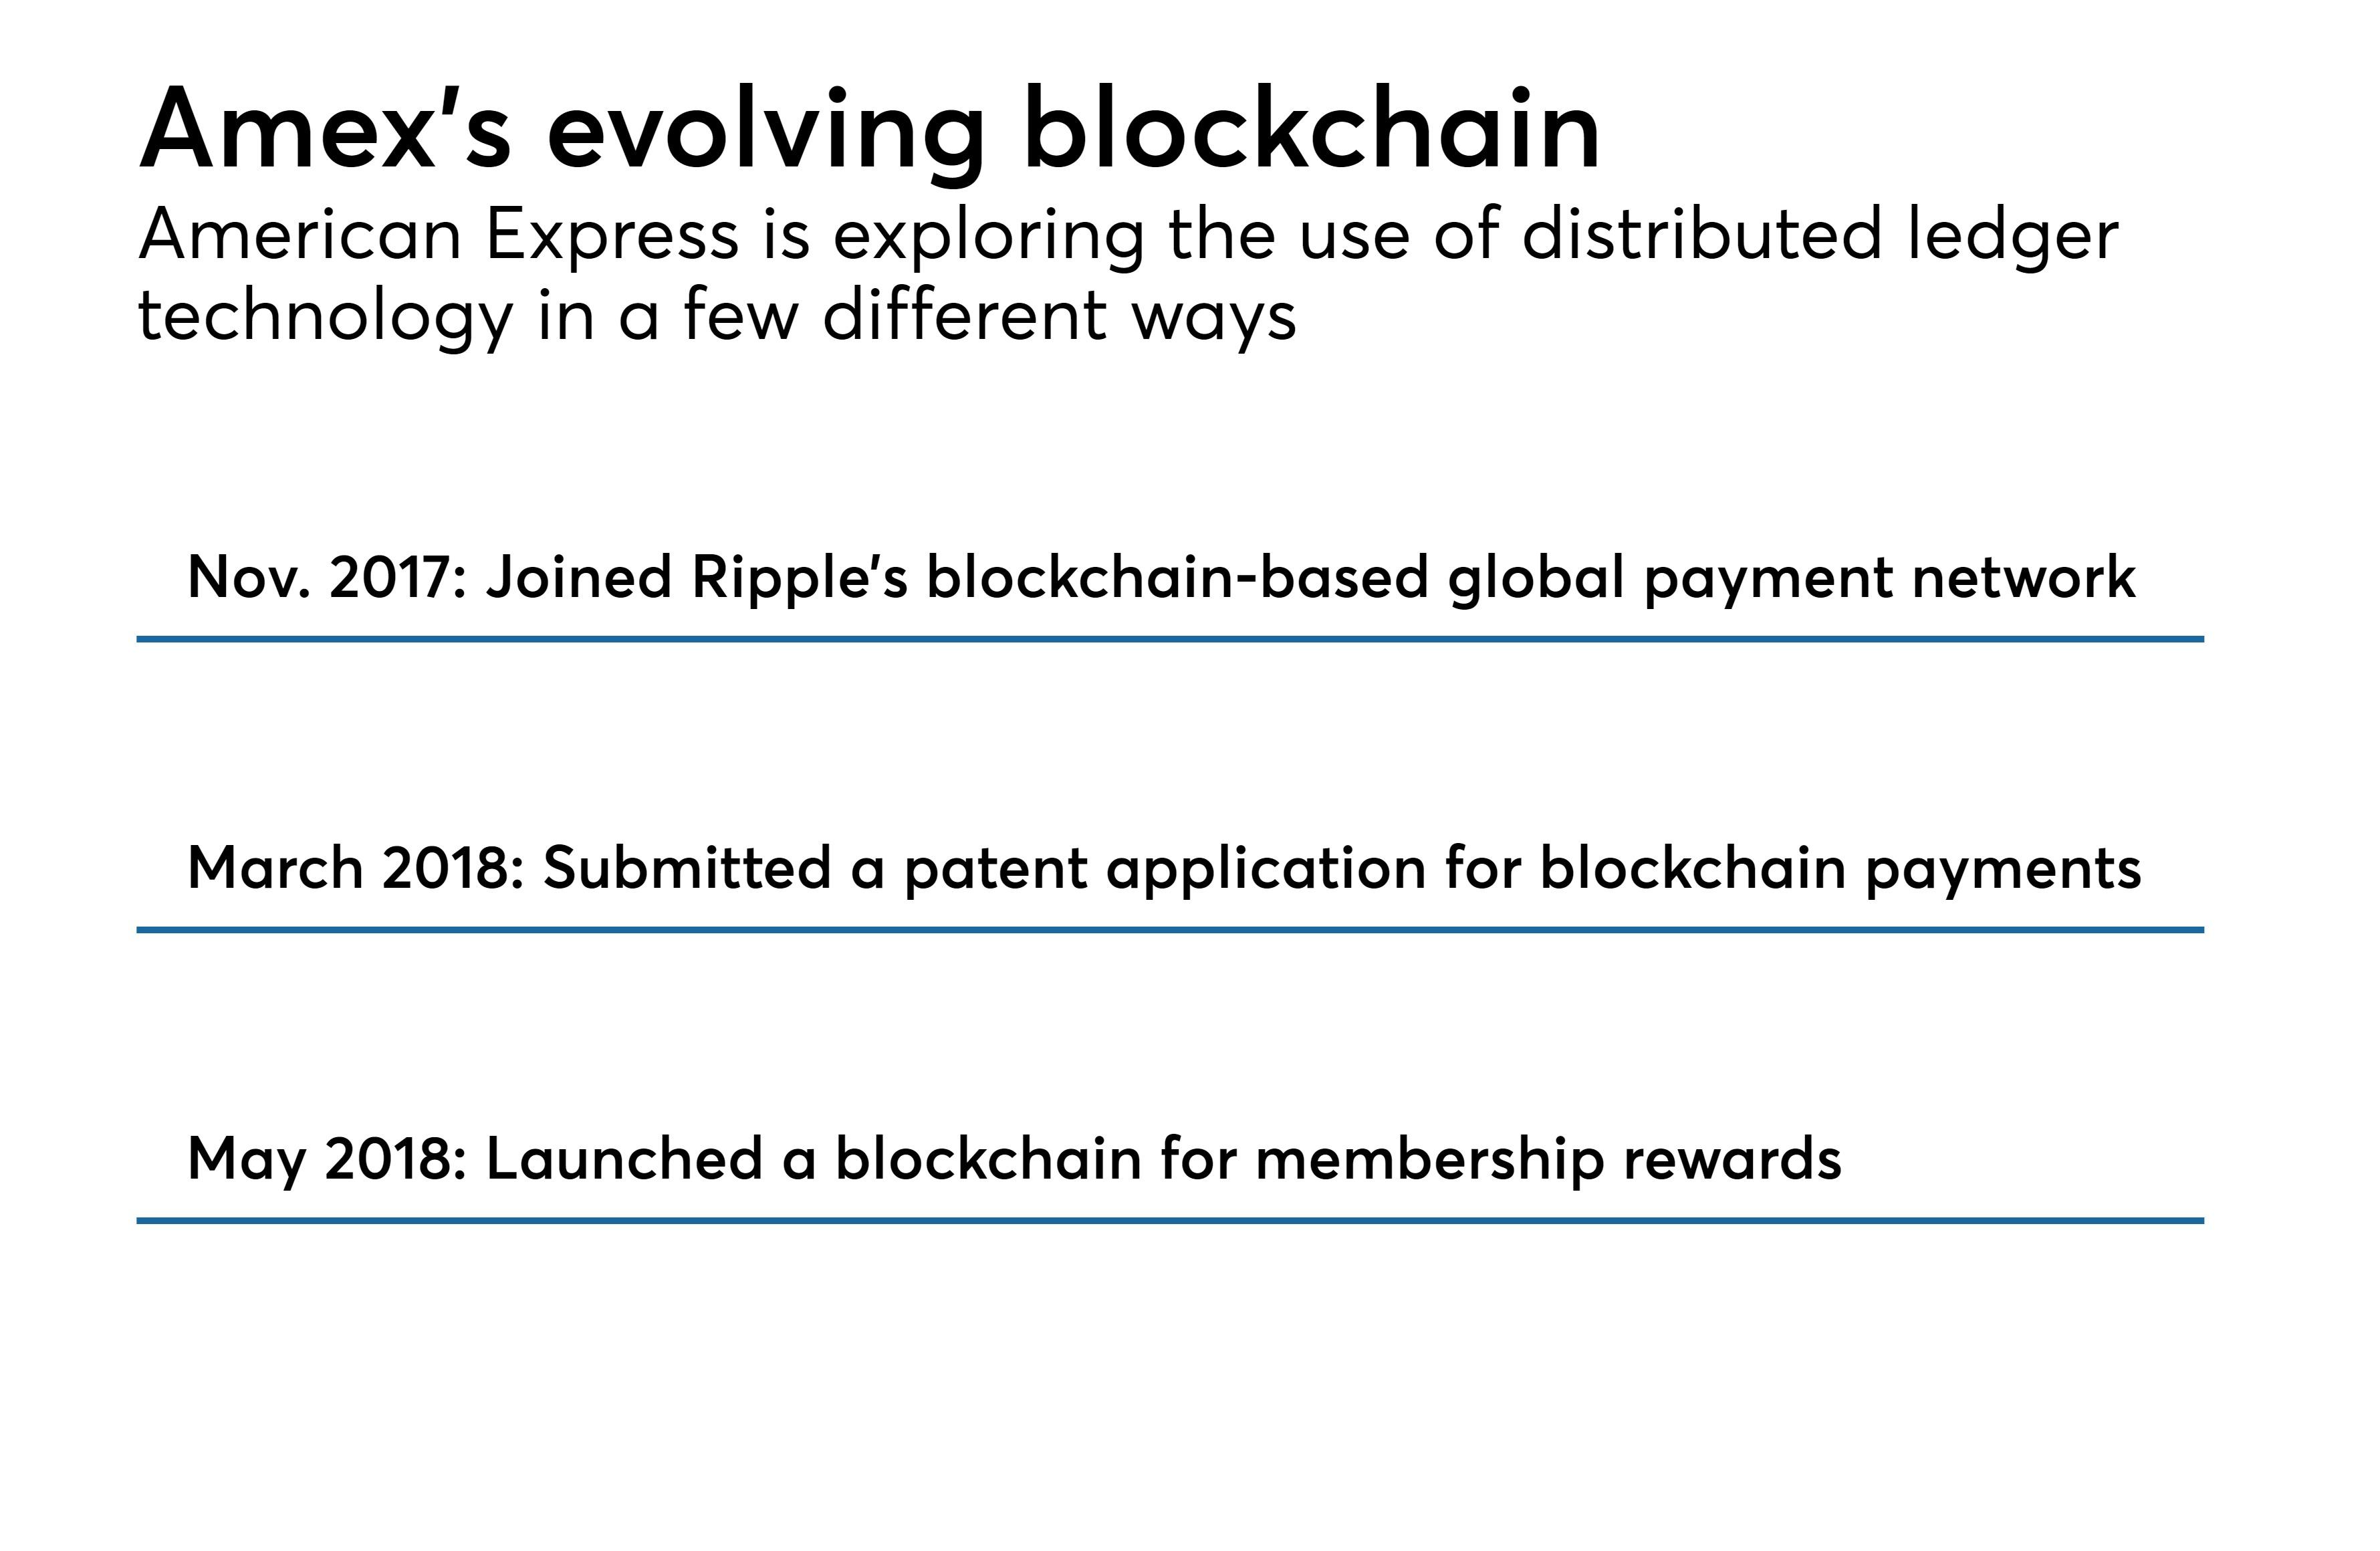 https://assets.sourcemedia.com/20/40/1348d6e04427bbf5b999344678d4/amex-evolving-blockchain.jpeg